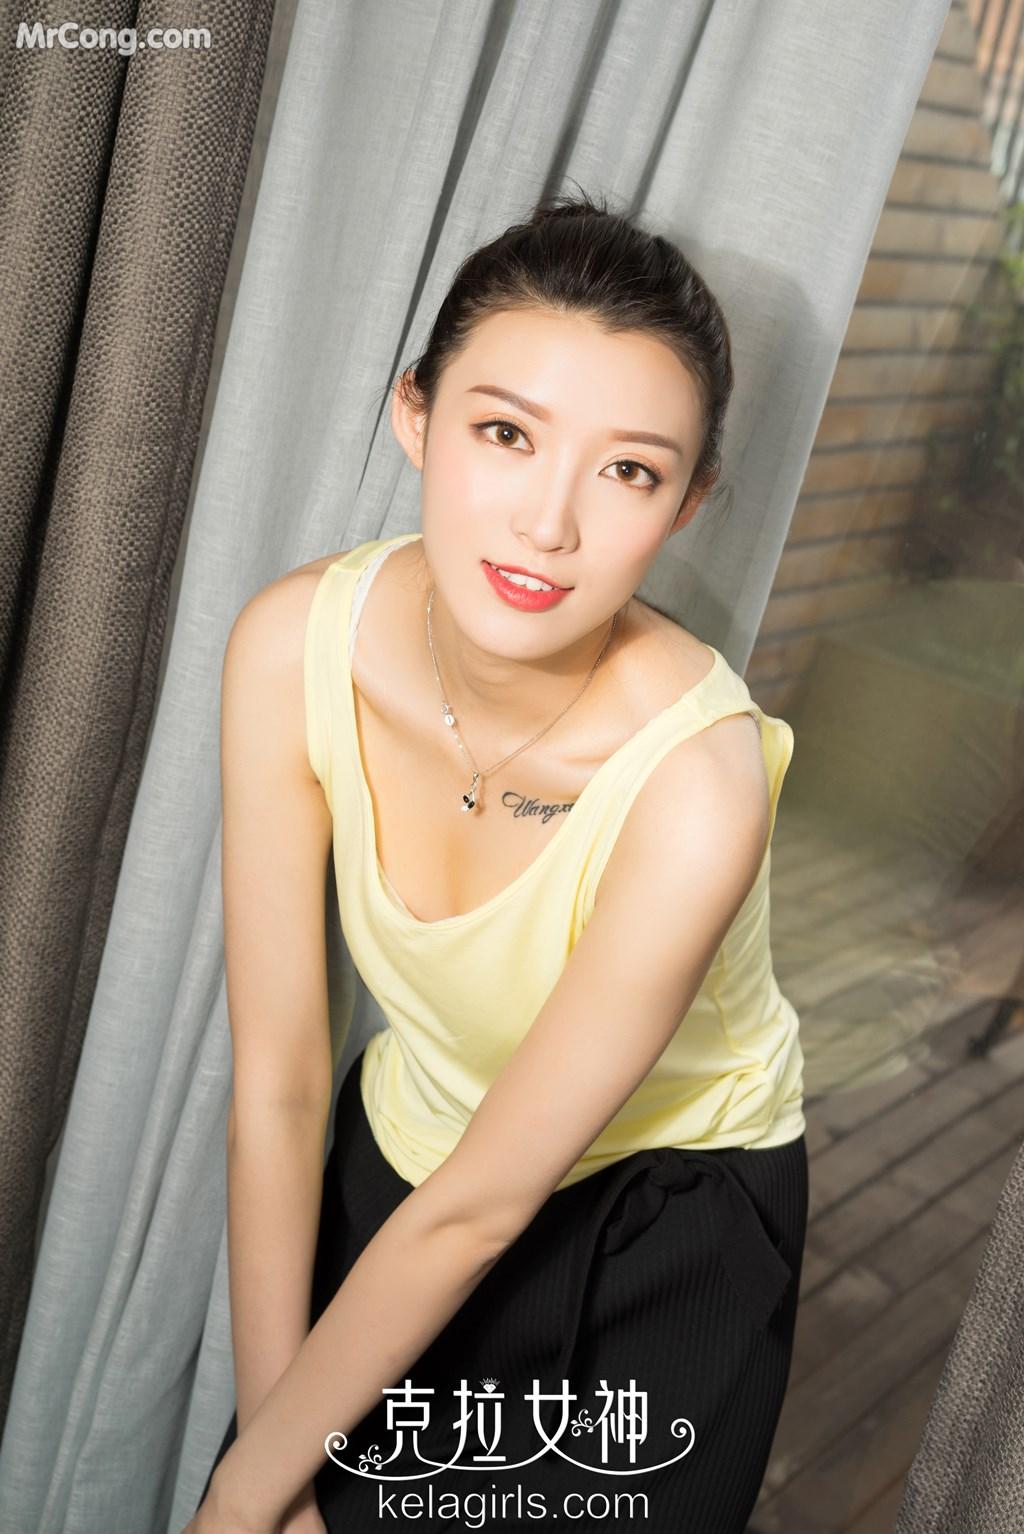 Image KelaGirls-2017-08-09-Zhao-Yujing-MrCong.com-002 in post KelaGirls 2017-08-09: Người mẫu Zhao Yujing (赵雨静) (21 ảnh)